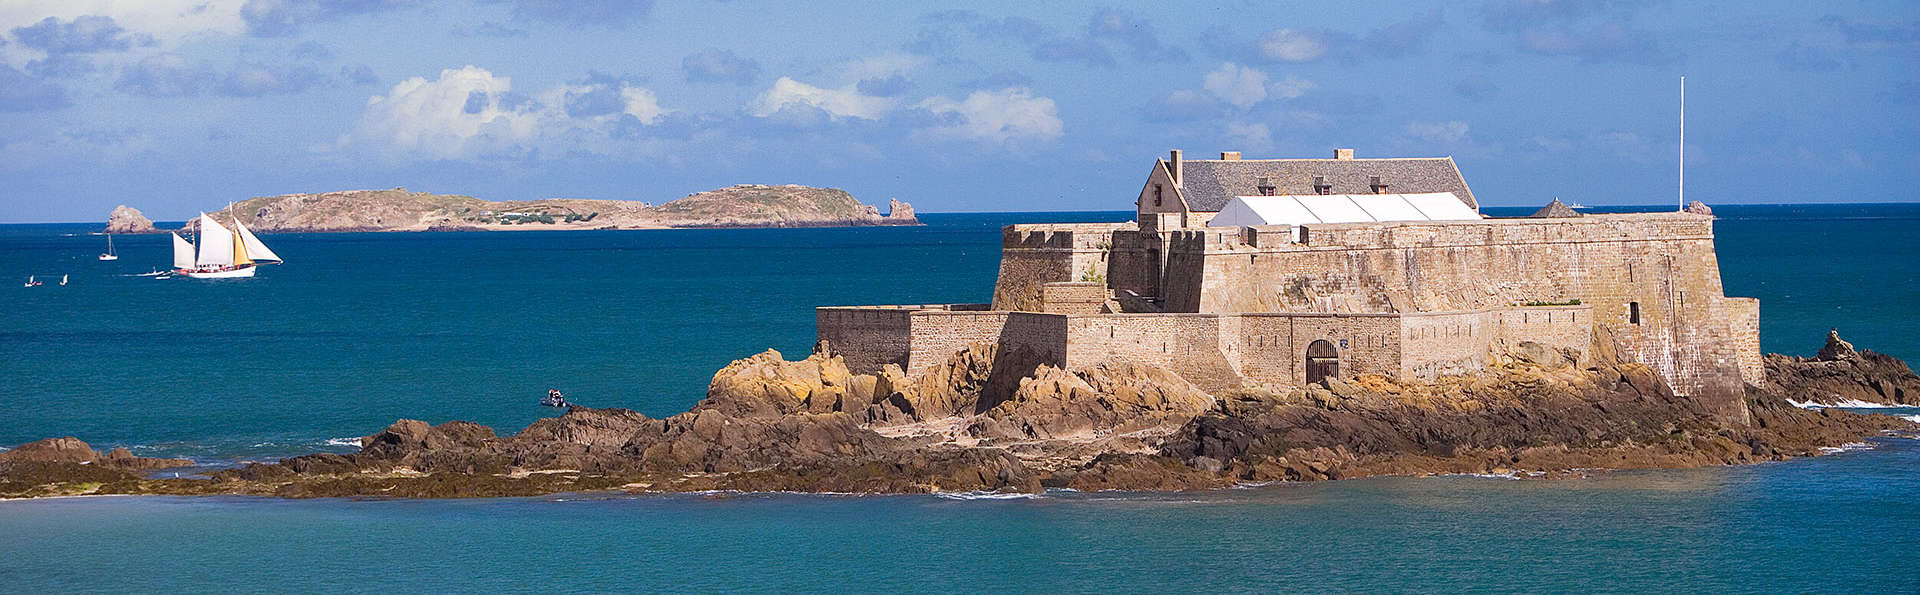 Oceania Saint-Malo - Edit_Destination6.jpg